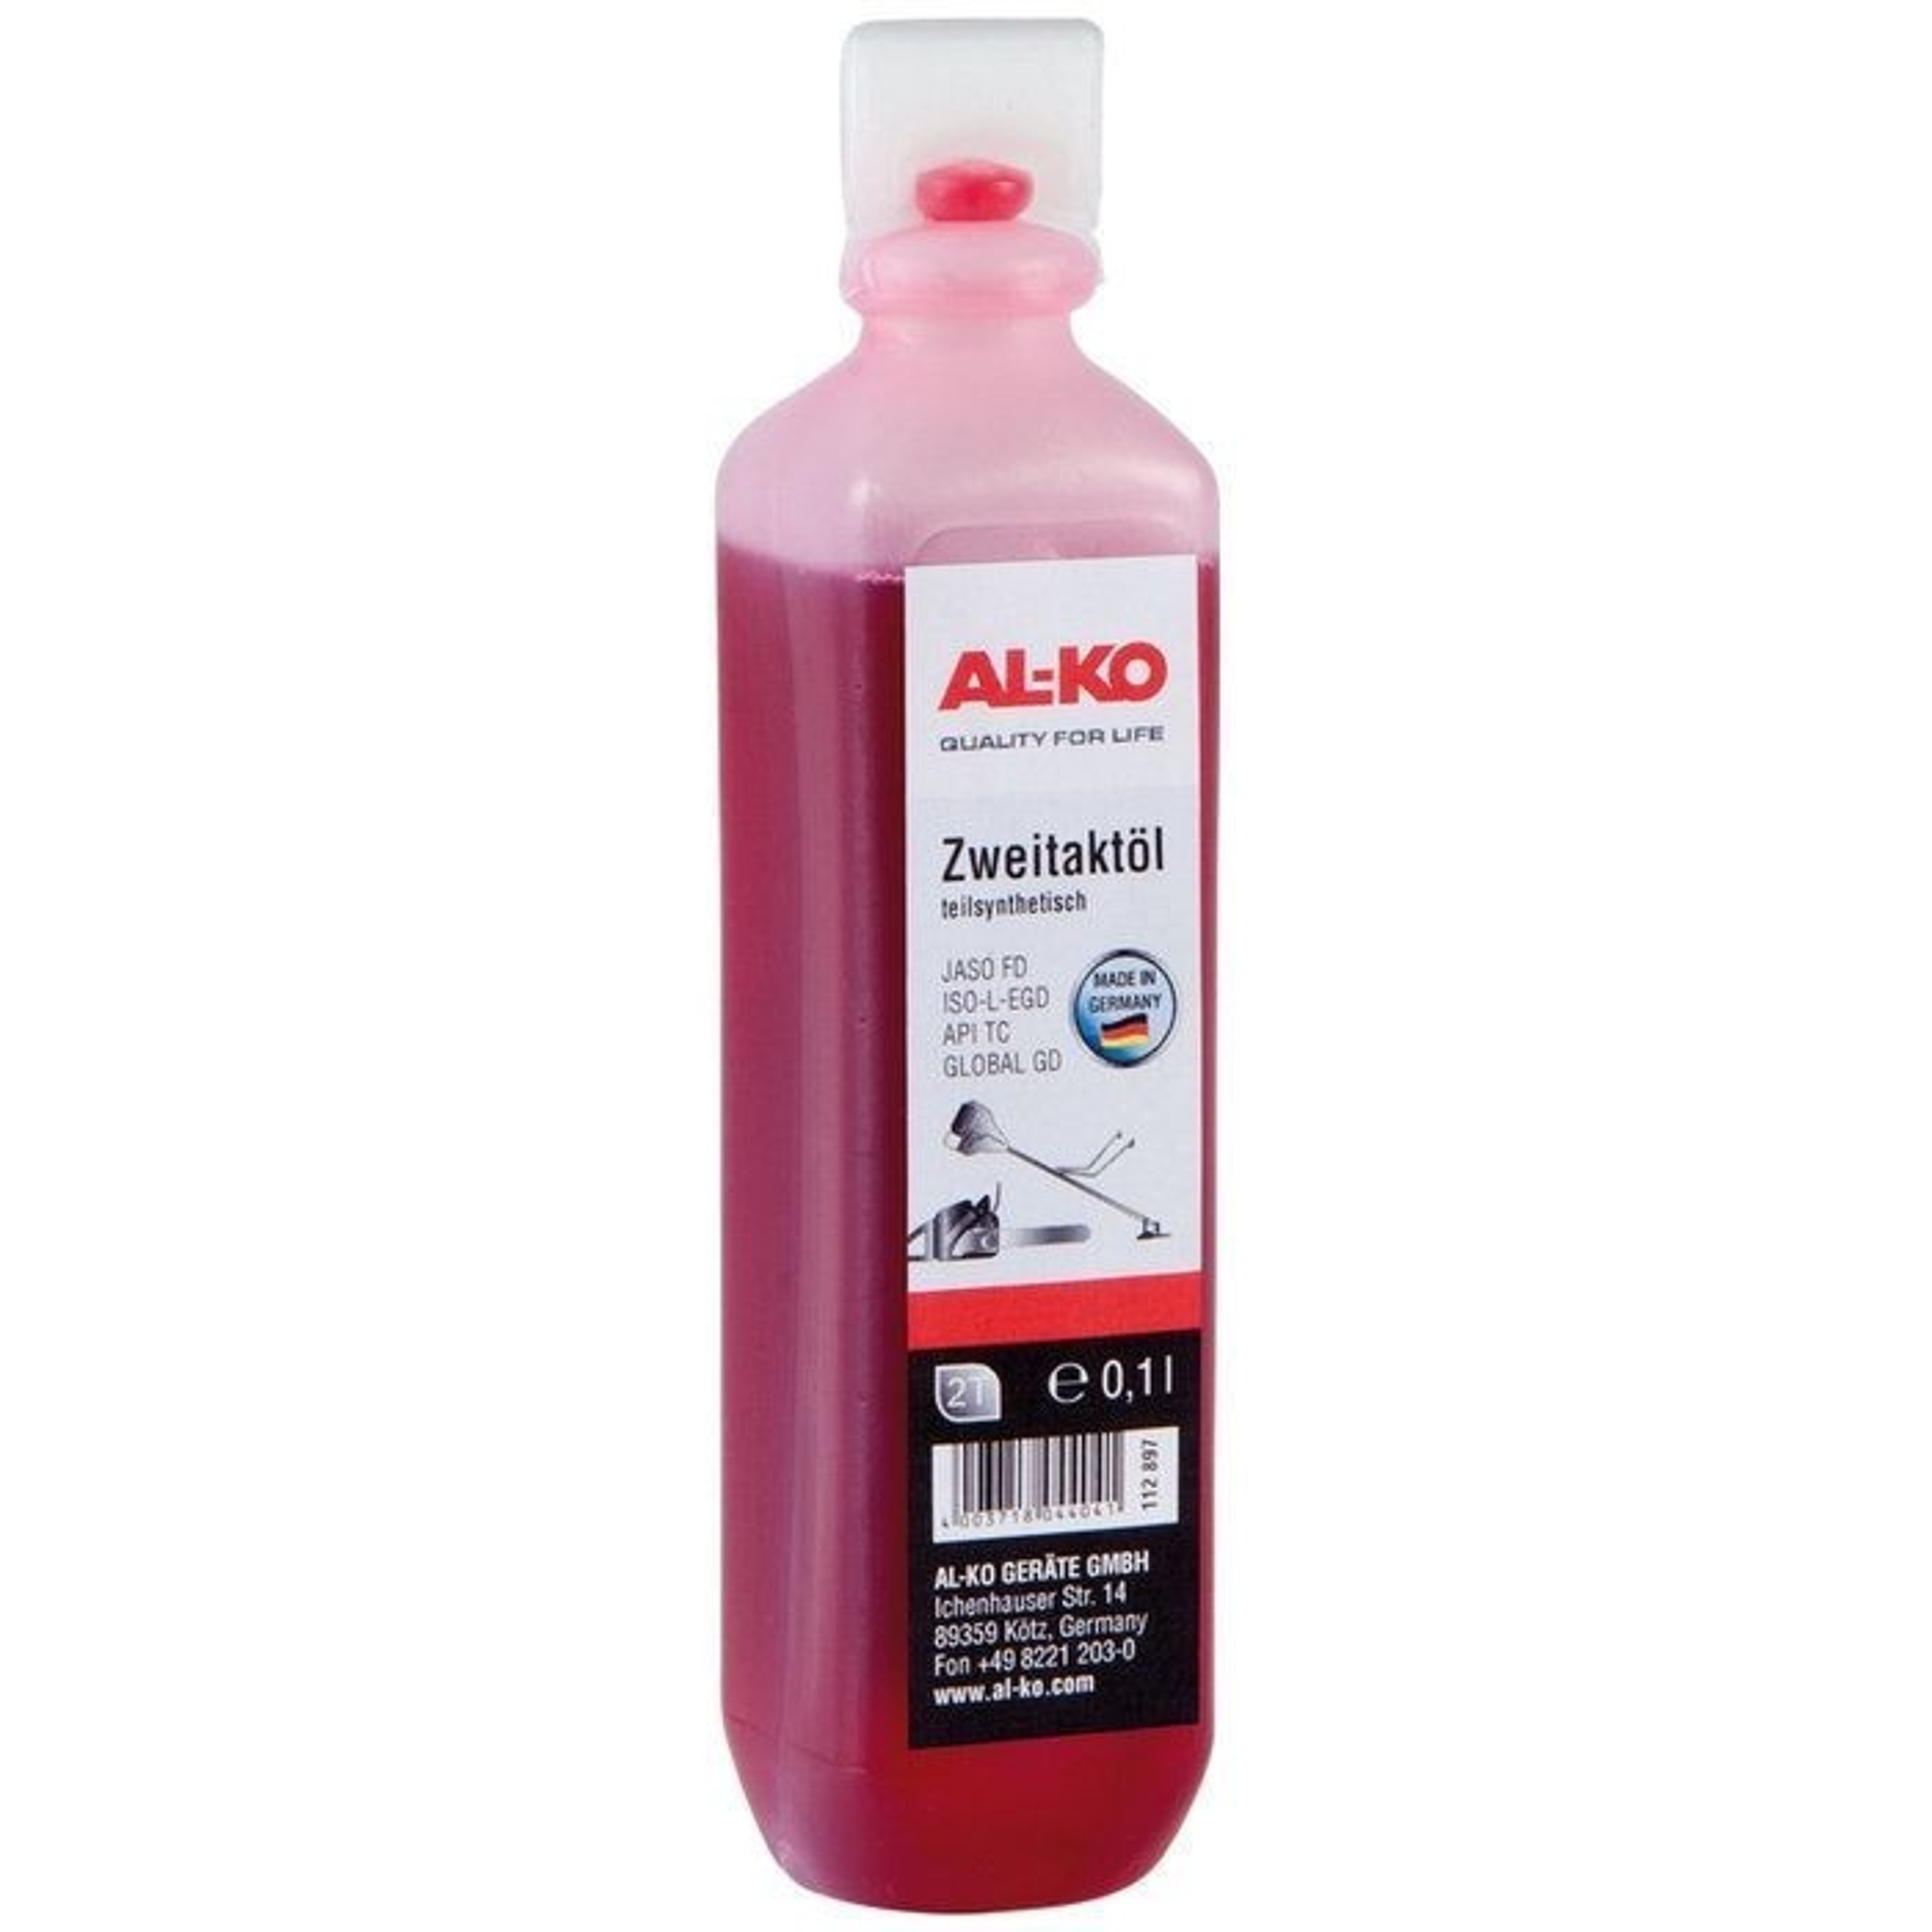 AL-KO 2-ütemű motorolaj félszintetikus - 0,1l 112916